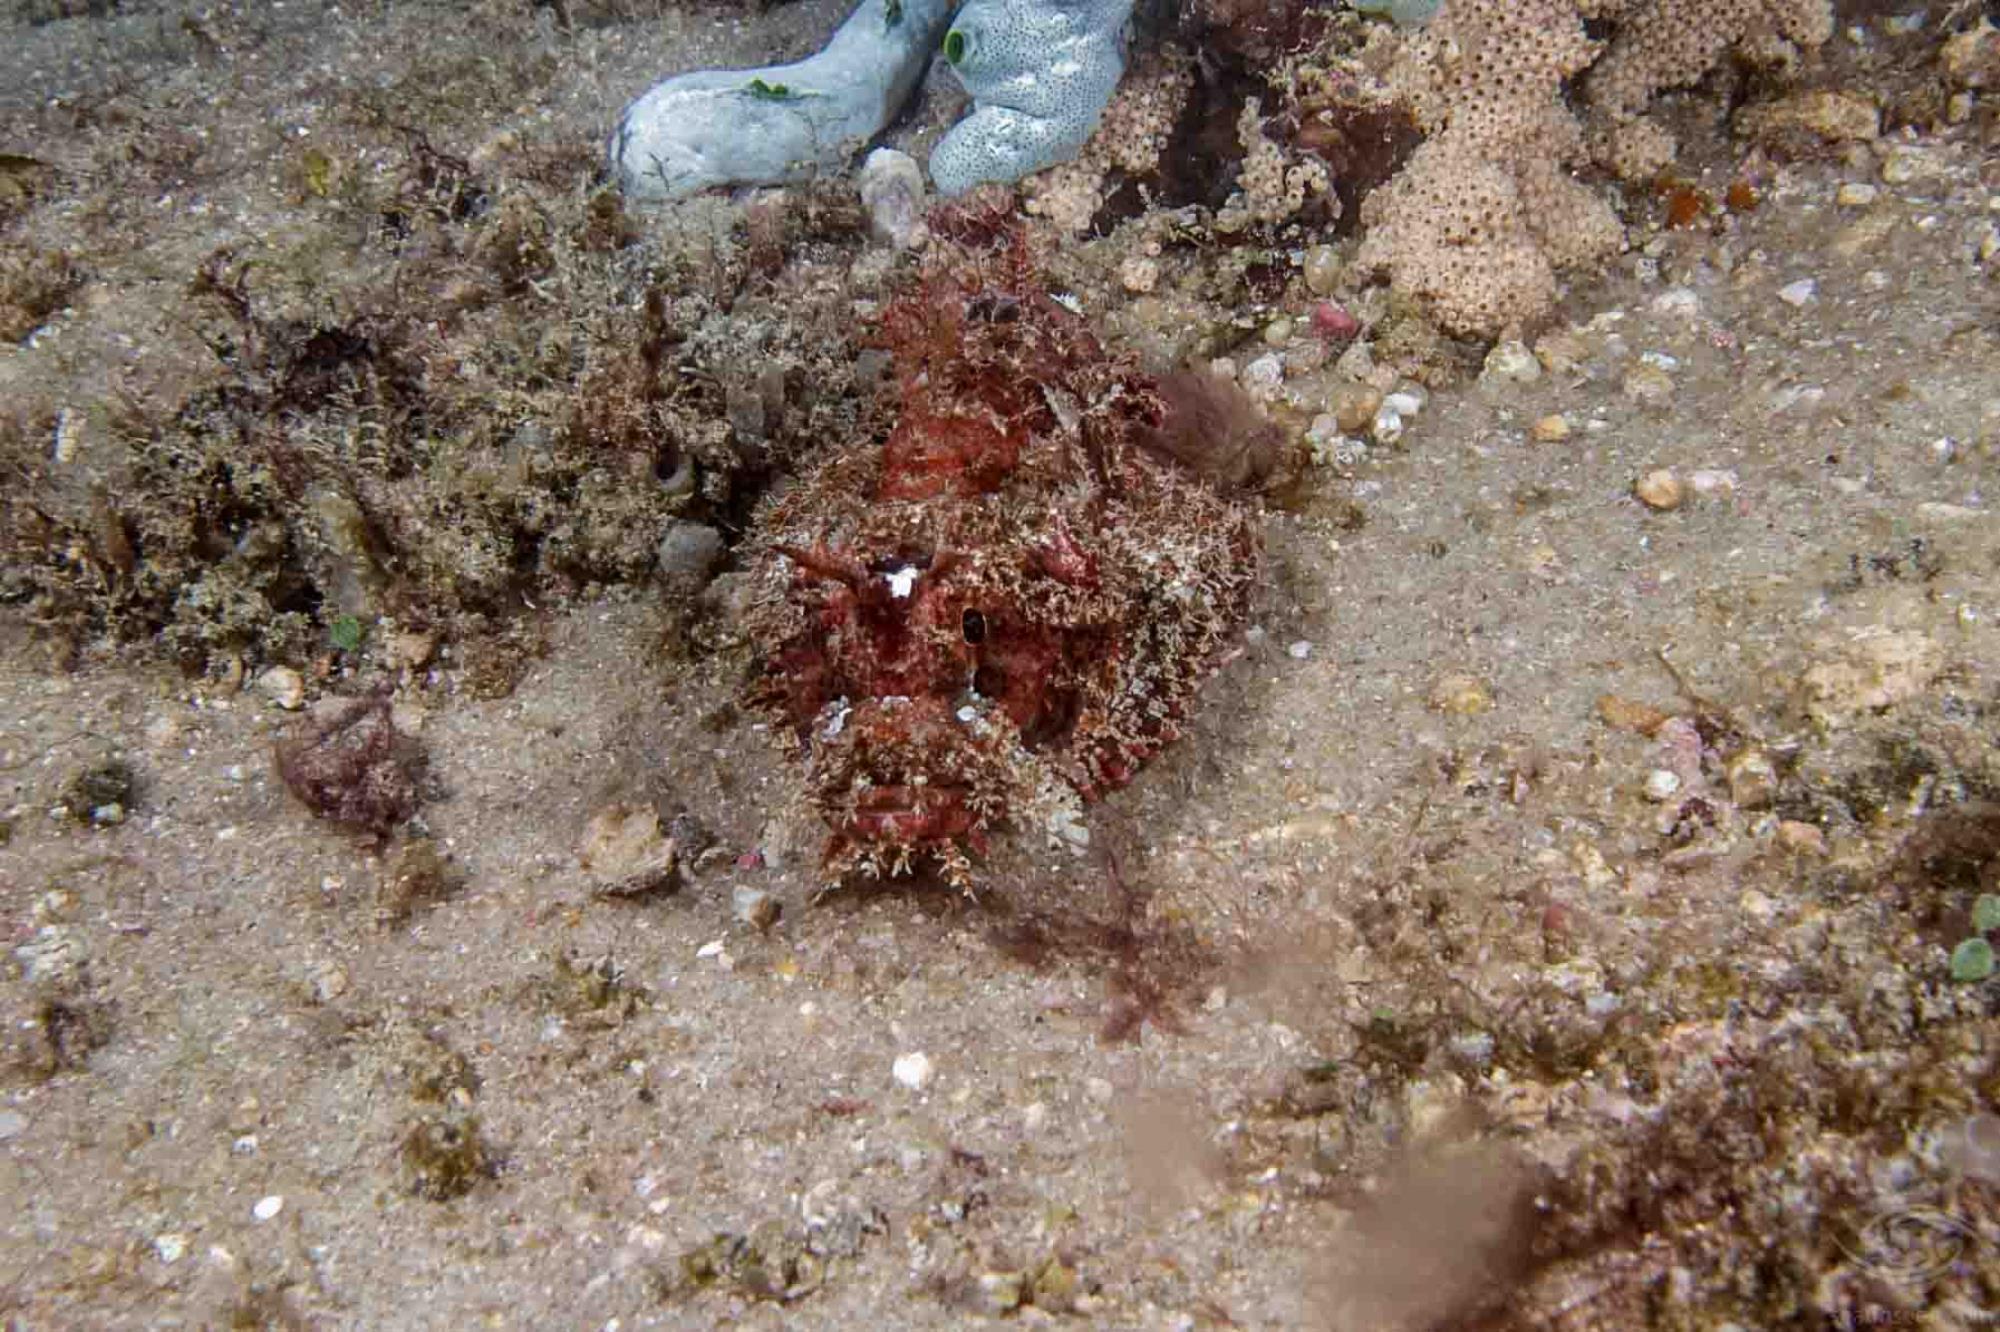 Mozambique scorpionfish Parascorpaena Mossambica